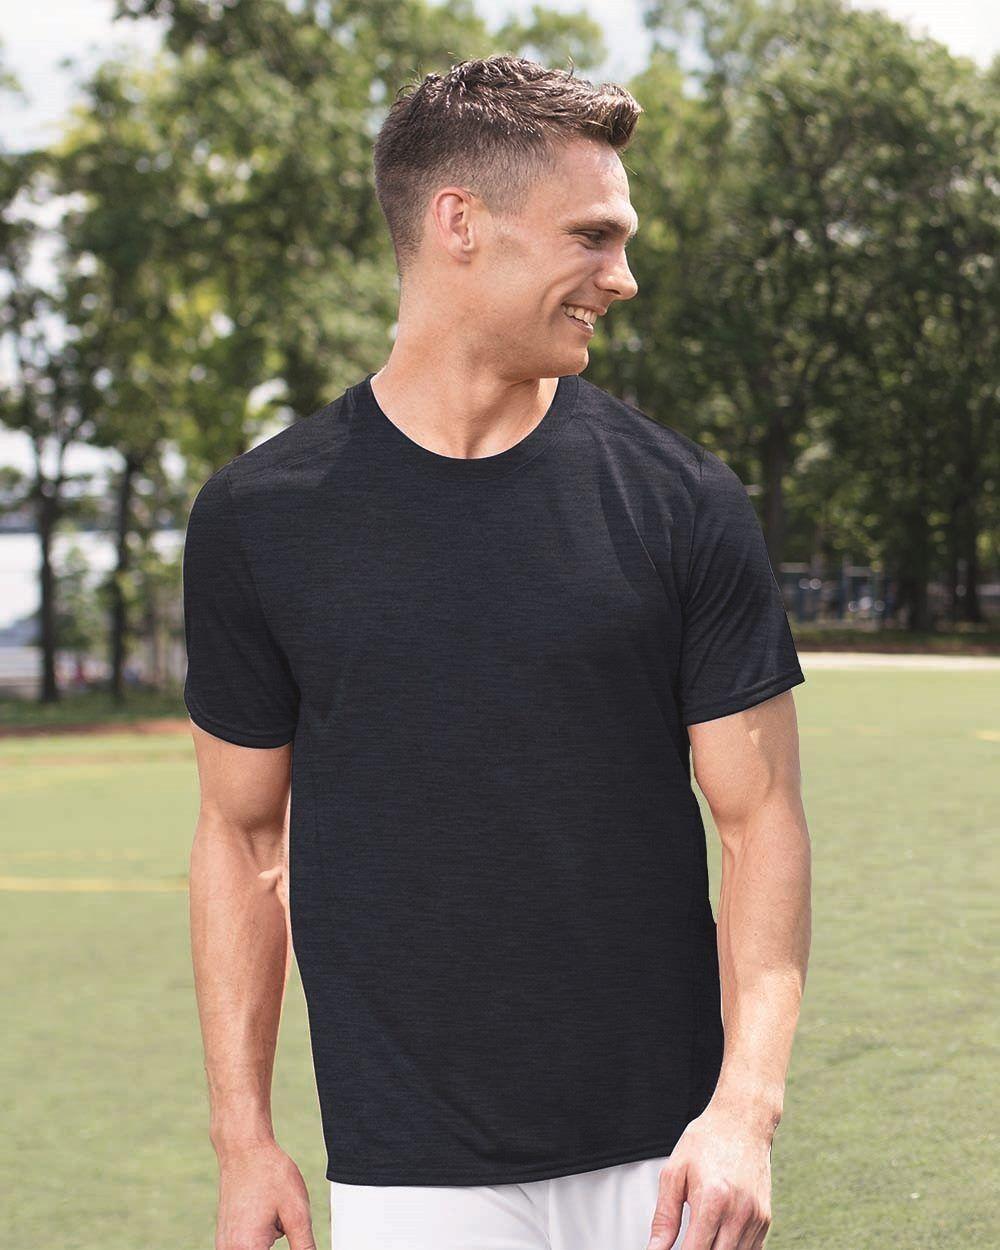 20 Gildan Performance Core Polyester G460 T-hemd Bulk Lot ok to mix S-XL Farbes